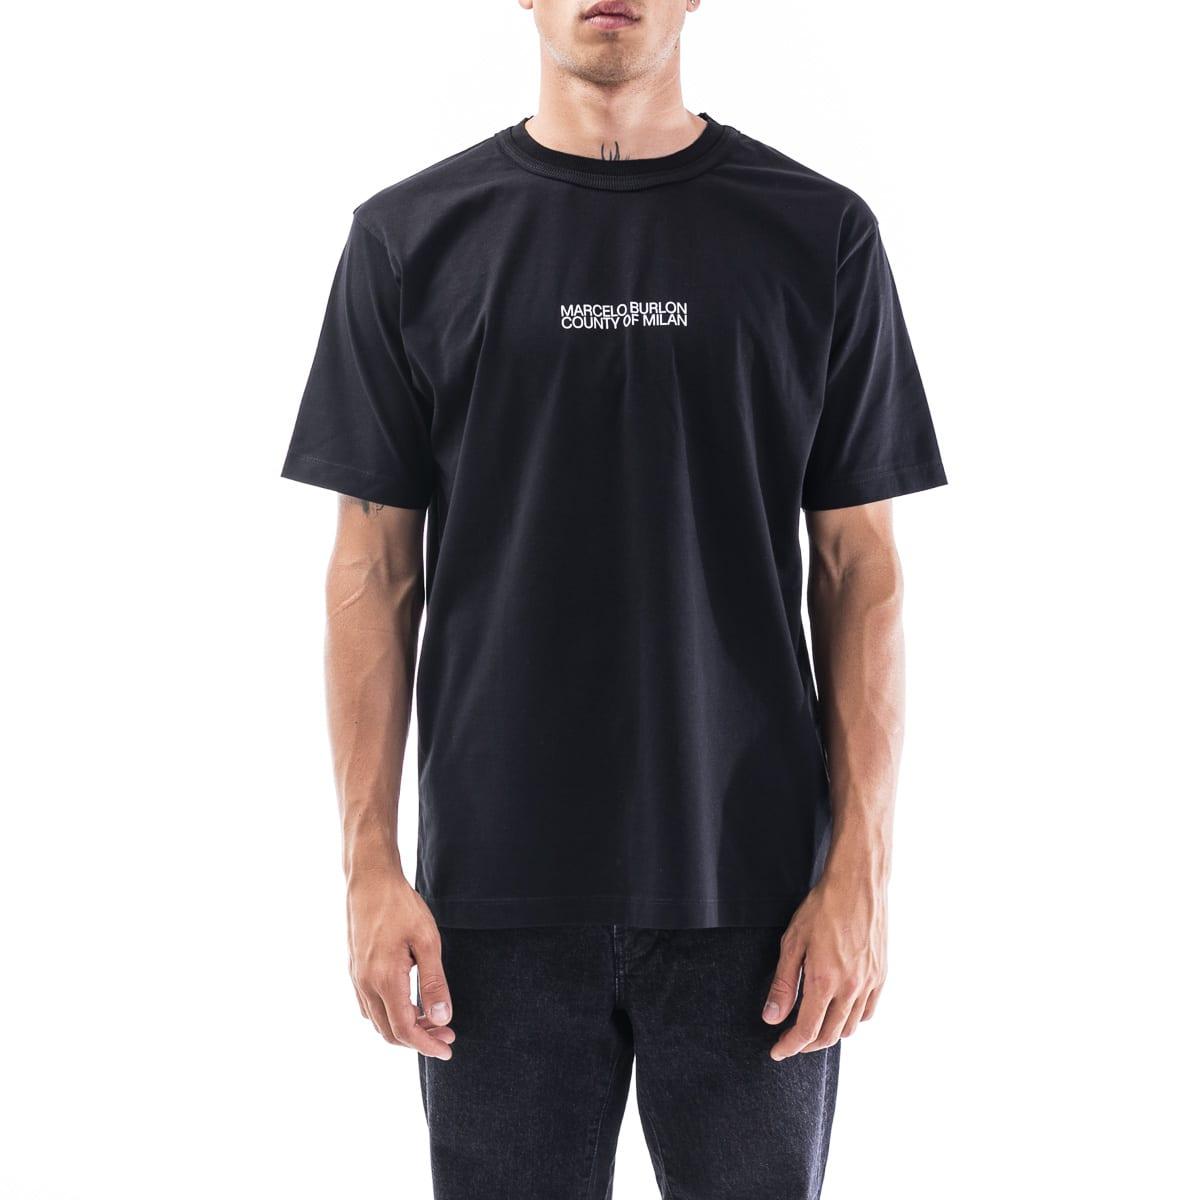 Marselo Burlon T-shirt